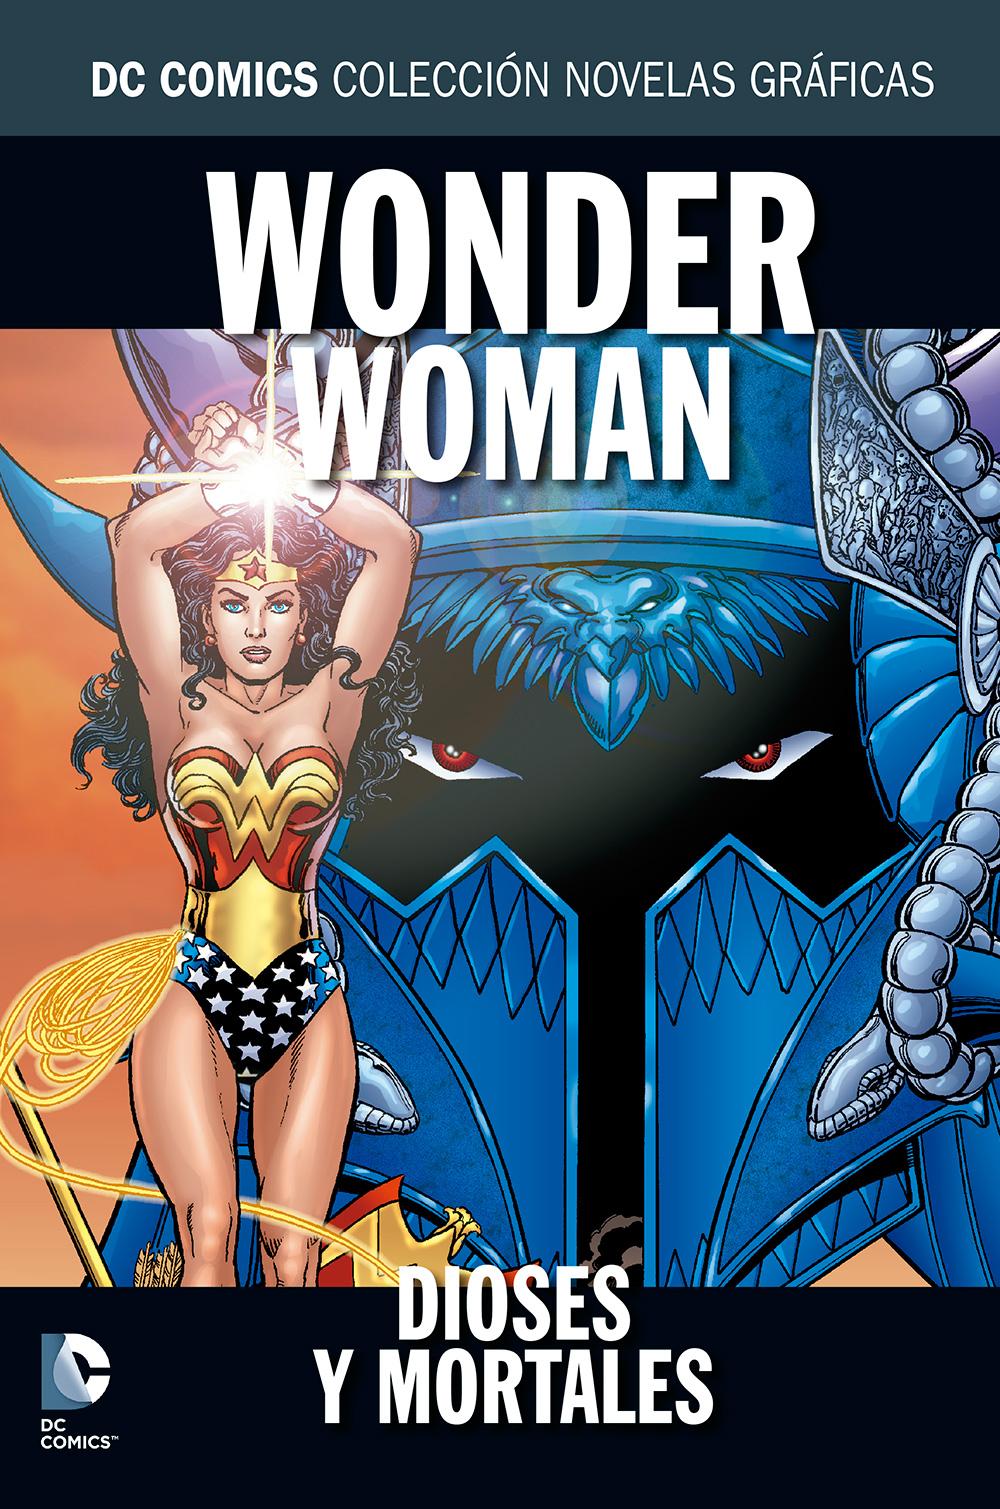 836 - [DC - Salvat] La Colección de Novelas Gráficas de DC Comics  SF118_034_01_001